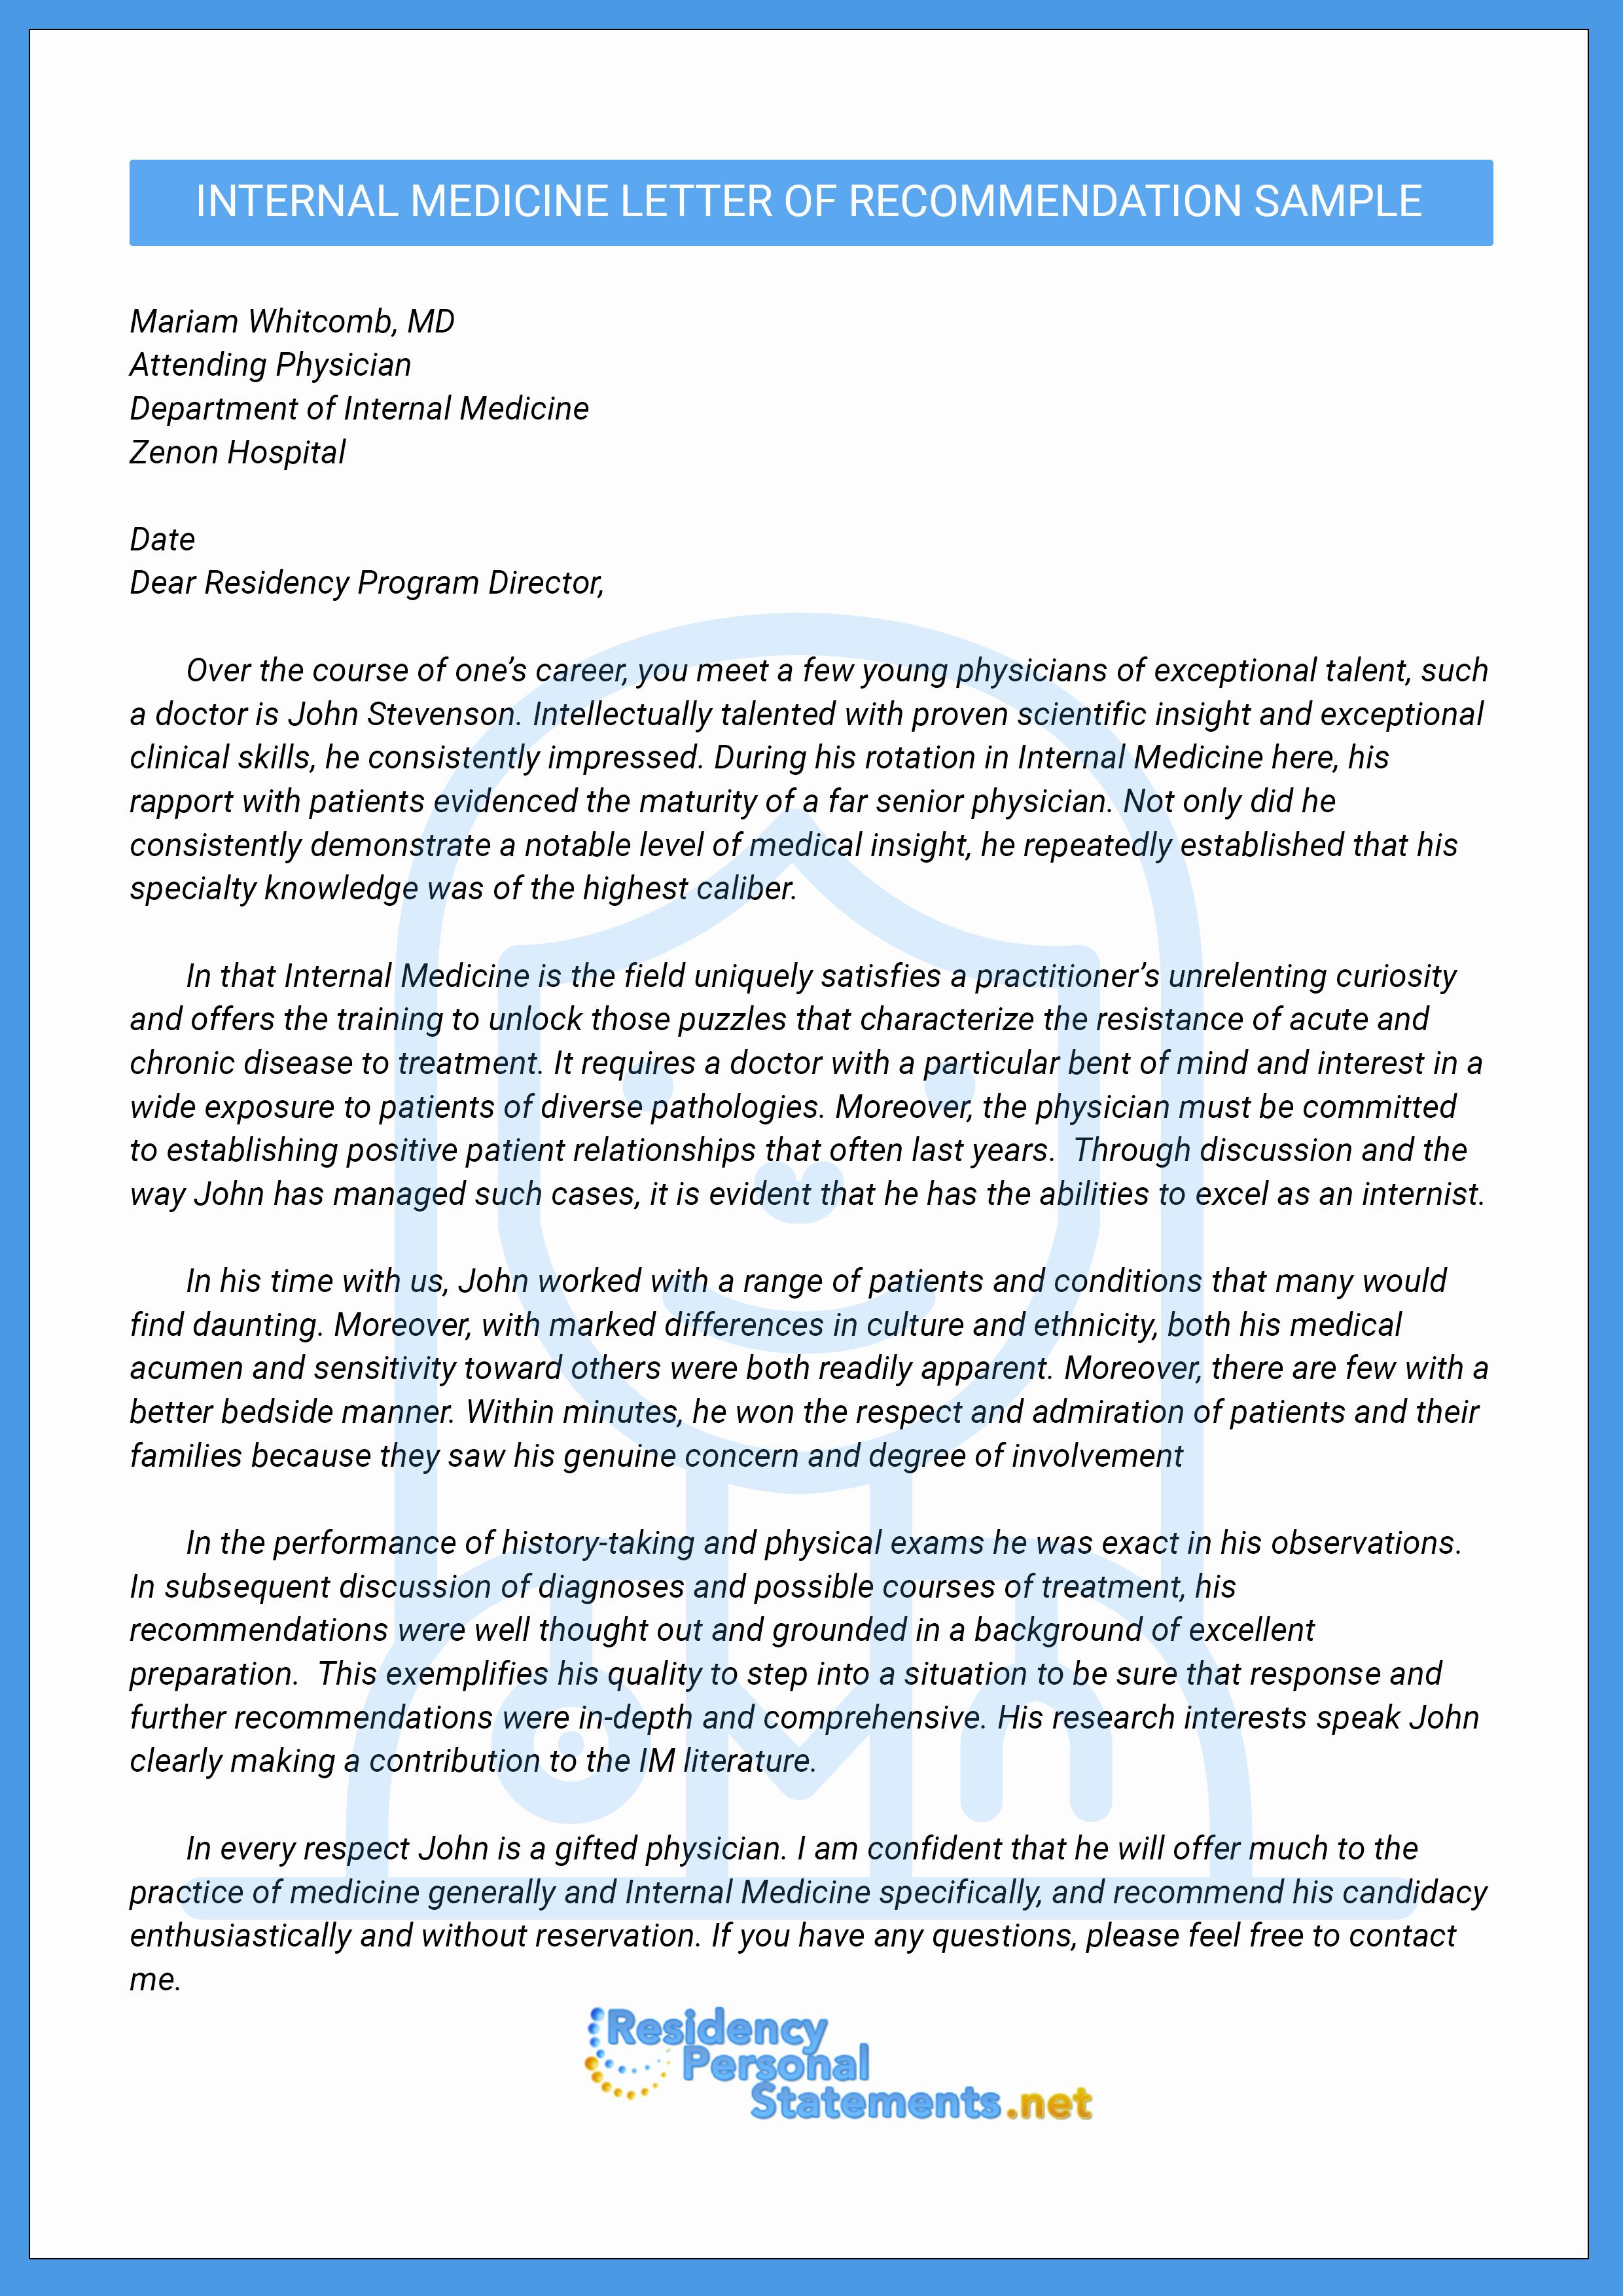 Sample Letter Of Recommendation Residency Inspirational Letter Of Re Mendation for Internal Medicine Residency